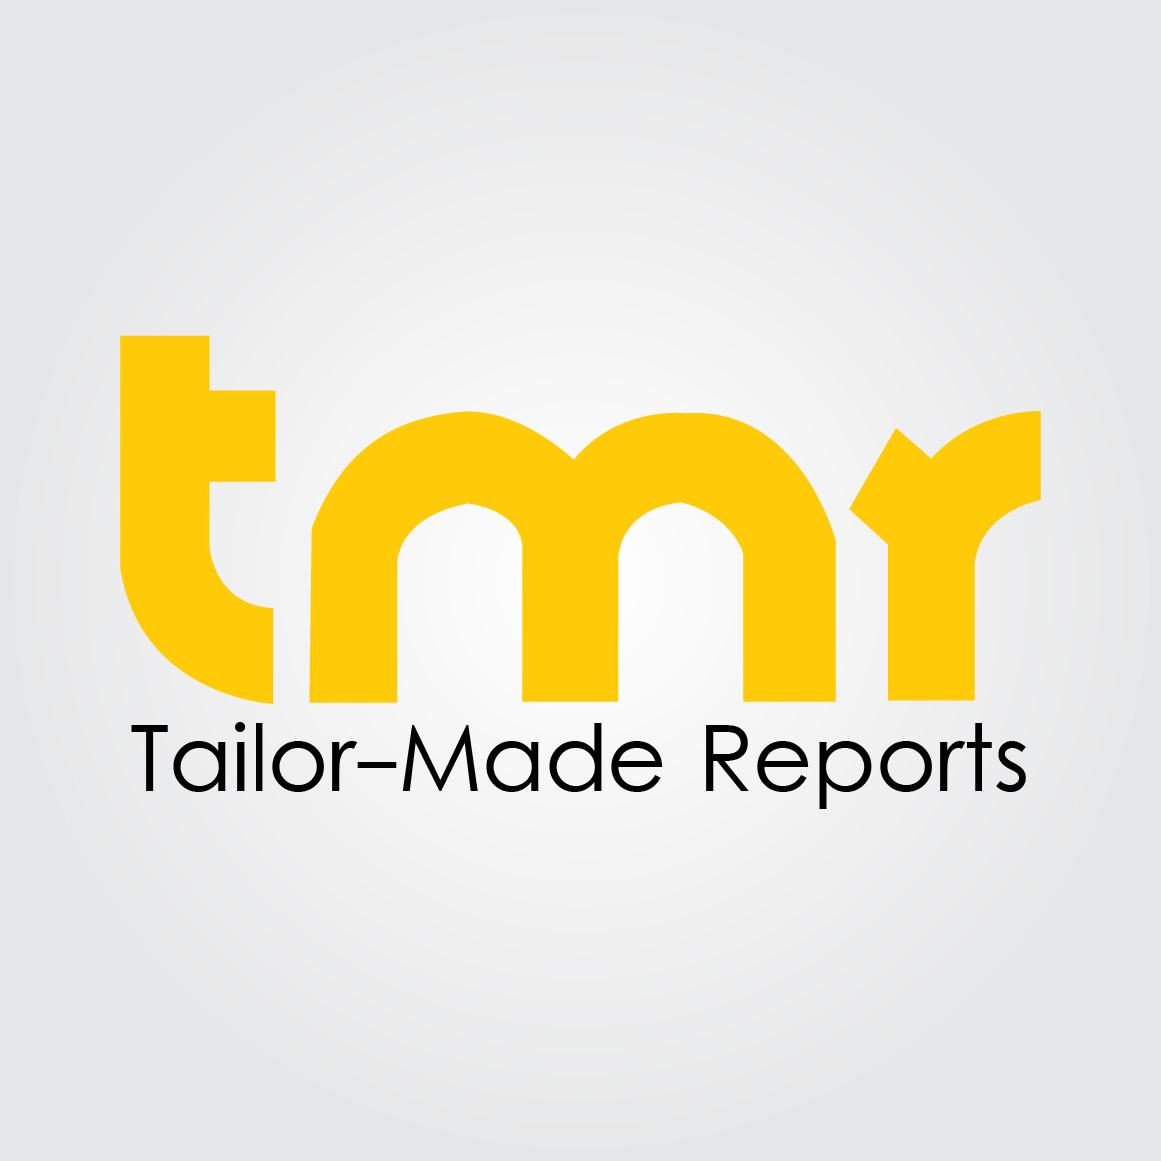 3D Printing High Performance Plastic Market Survey | Detailed Study Analysis